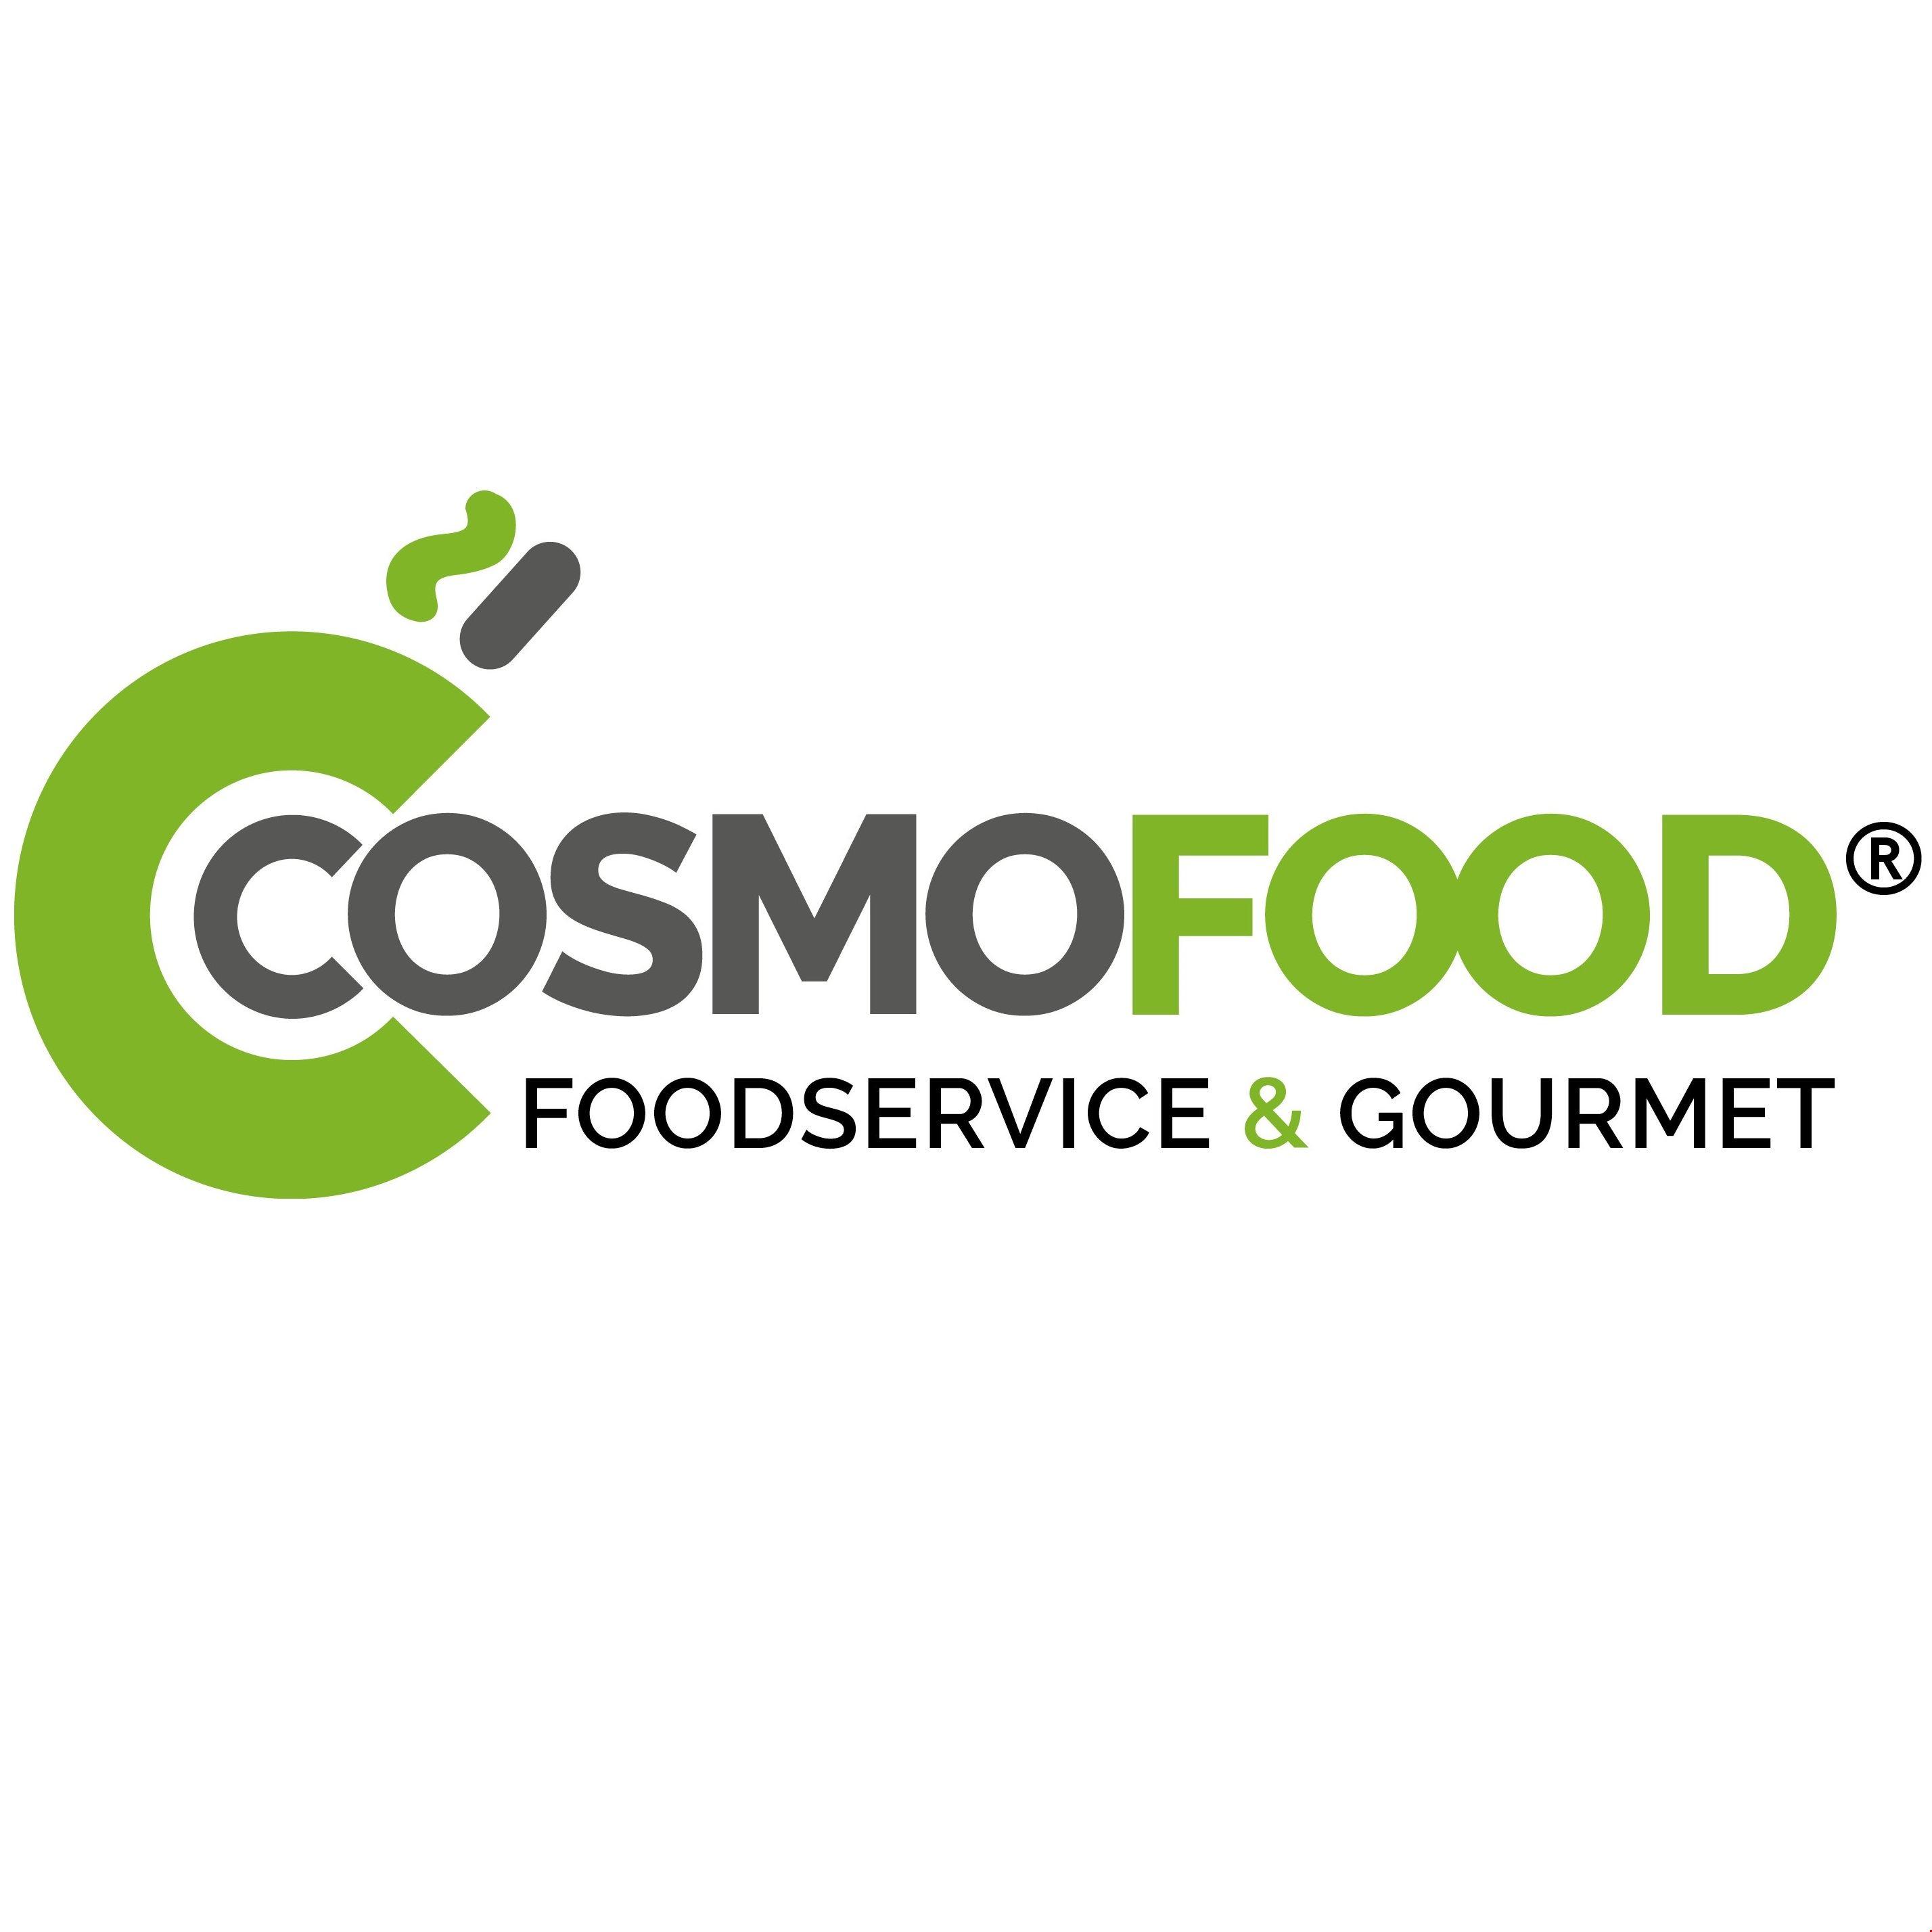 CosmoFood_logo_2018-prova.jpg